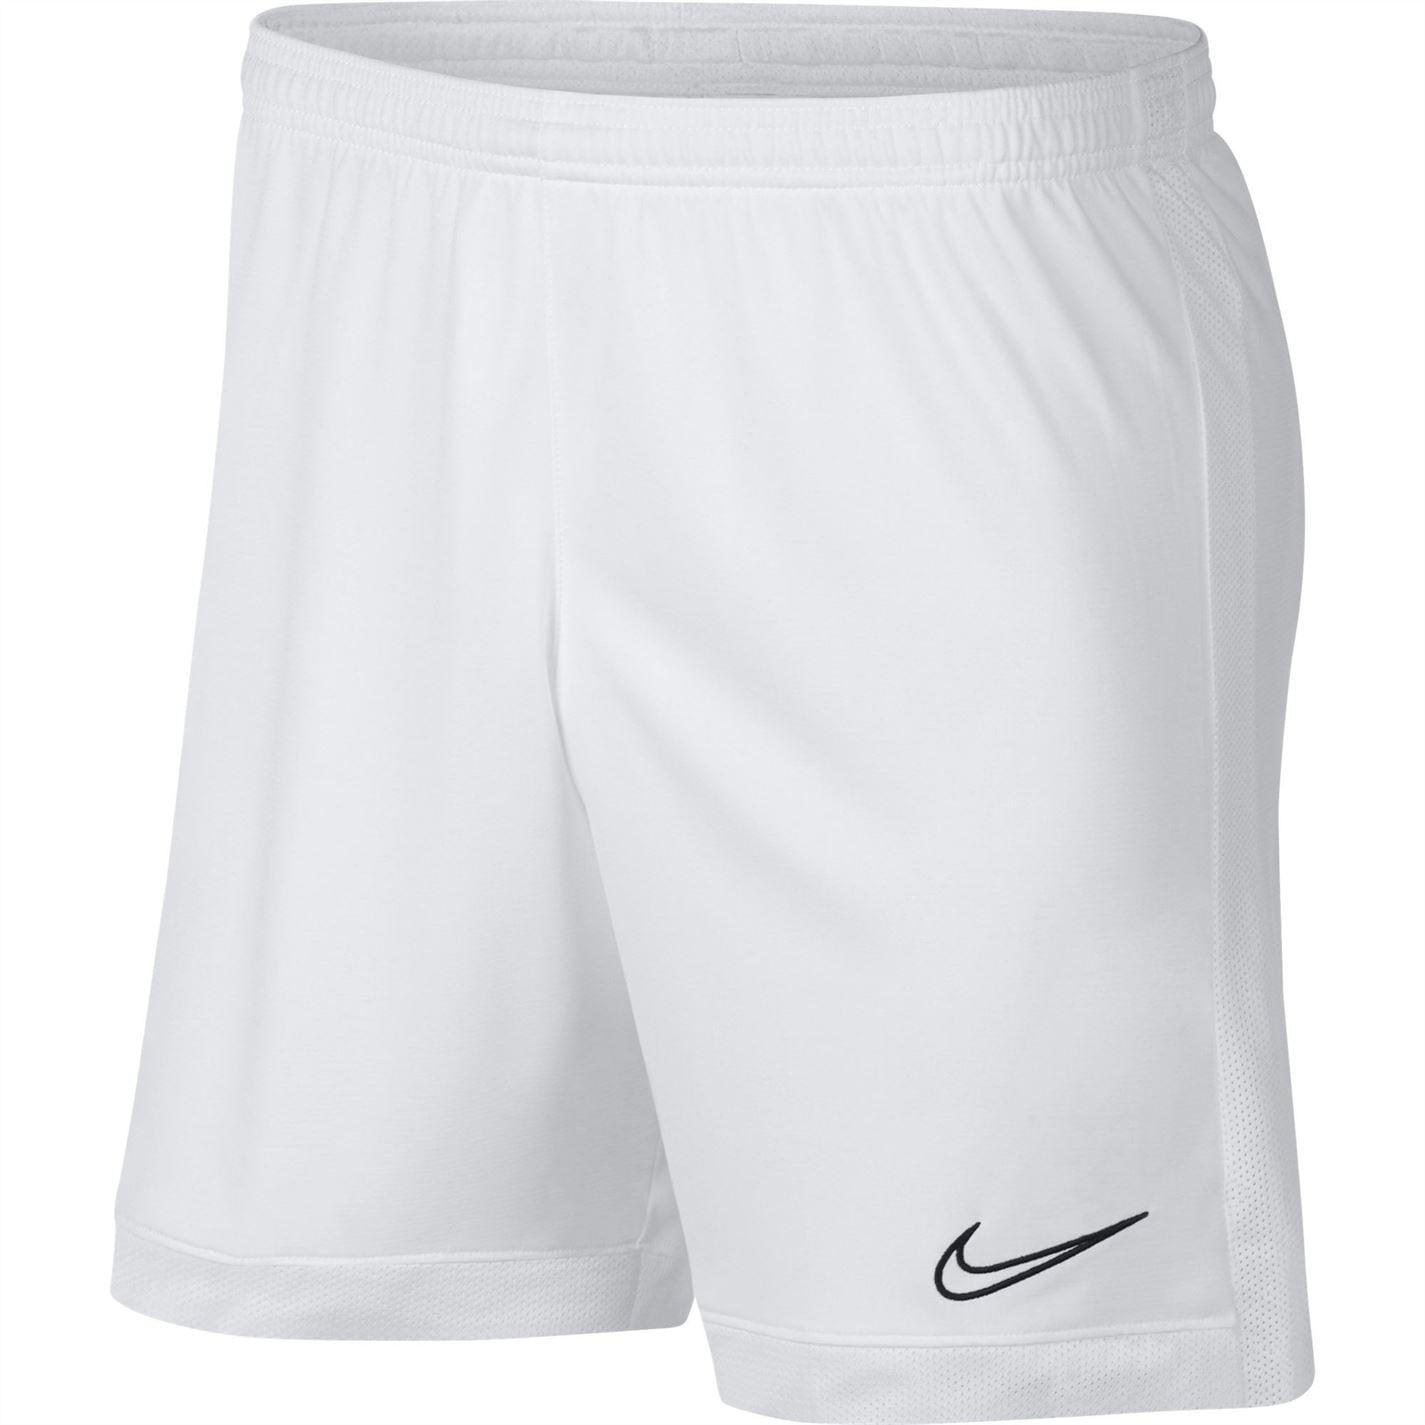 Pantaloni scurti Nike Dri-FIT Academy Soccer pentru Barbati alb